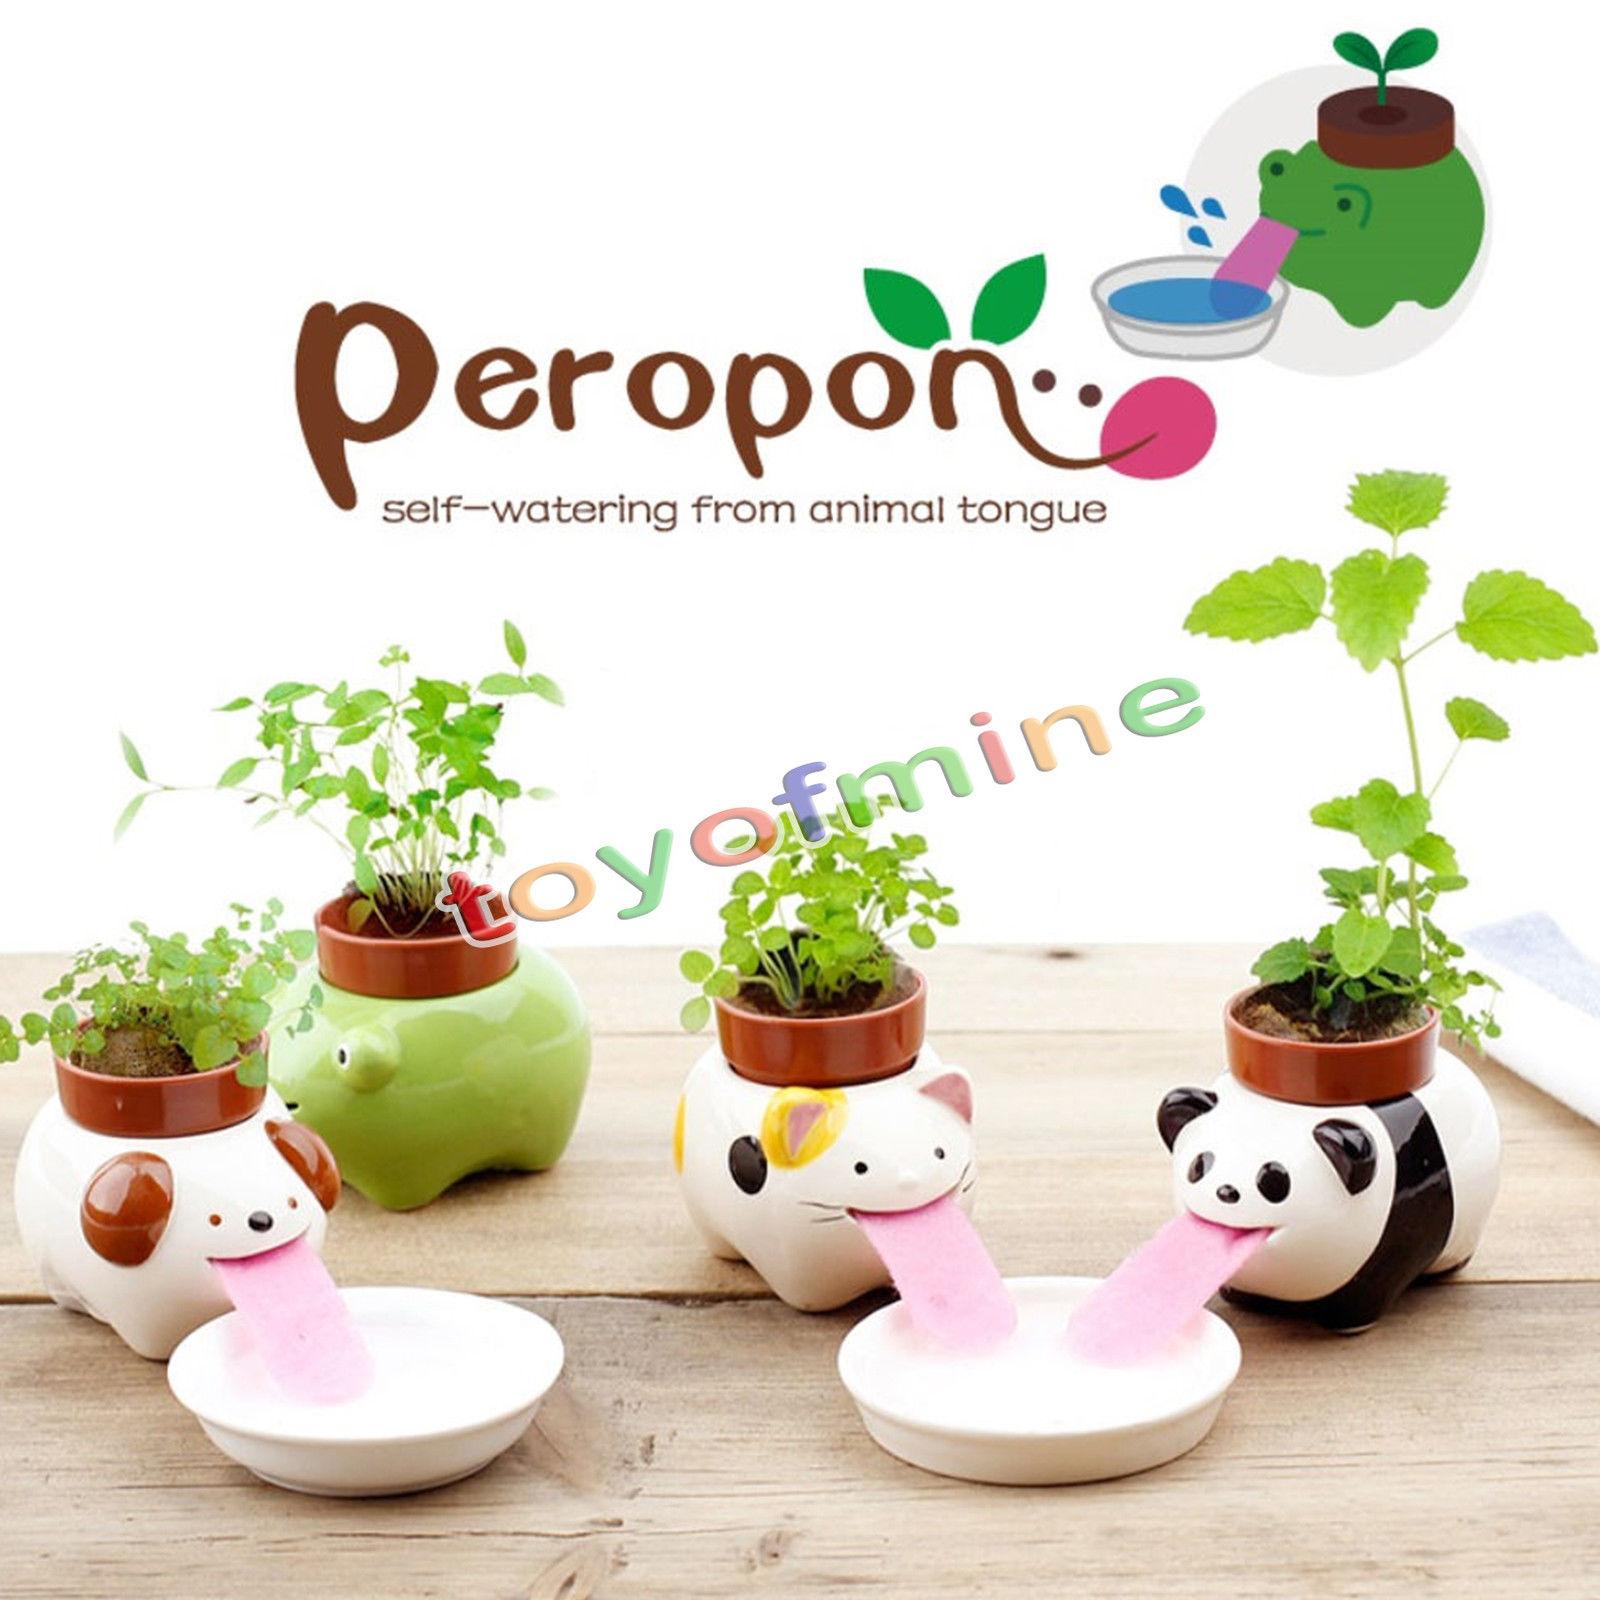 Cute Ceramic Cultivation Peropon Drinking Animal Planter